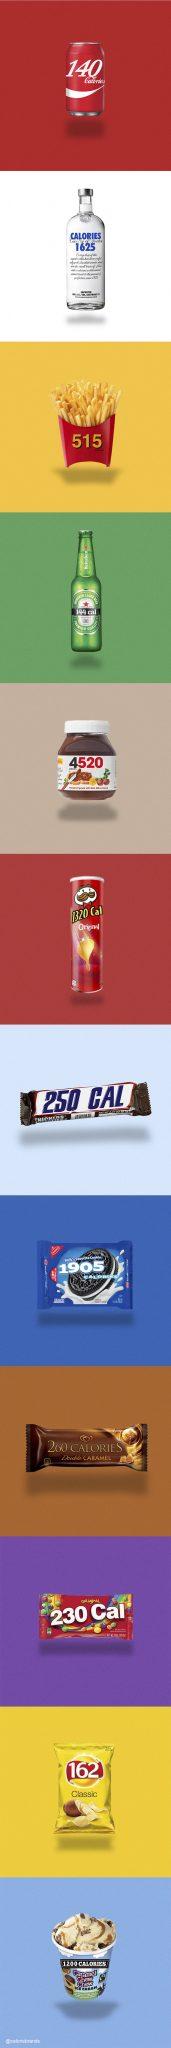 honest-product-logos-caloriebrands1 (1)